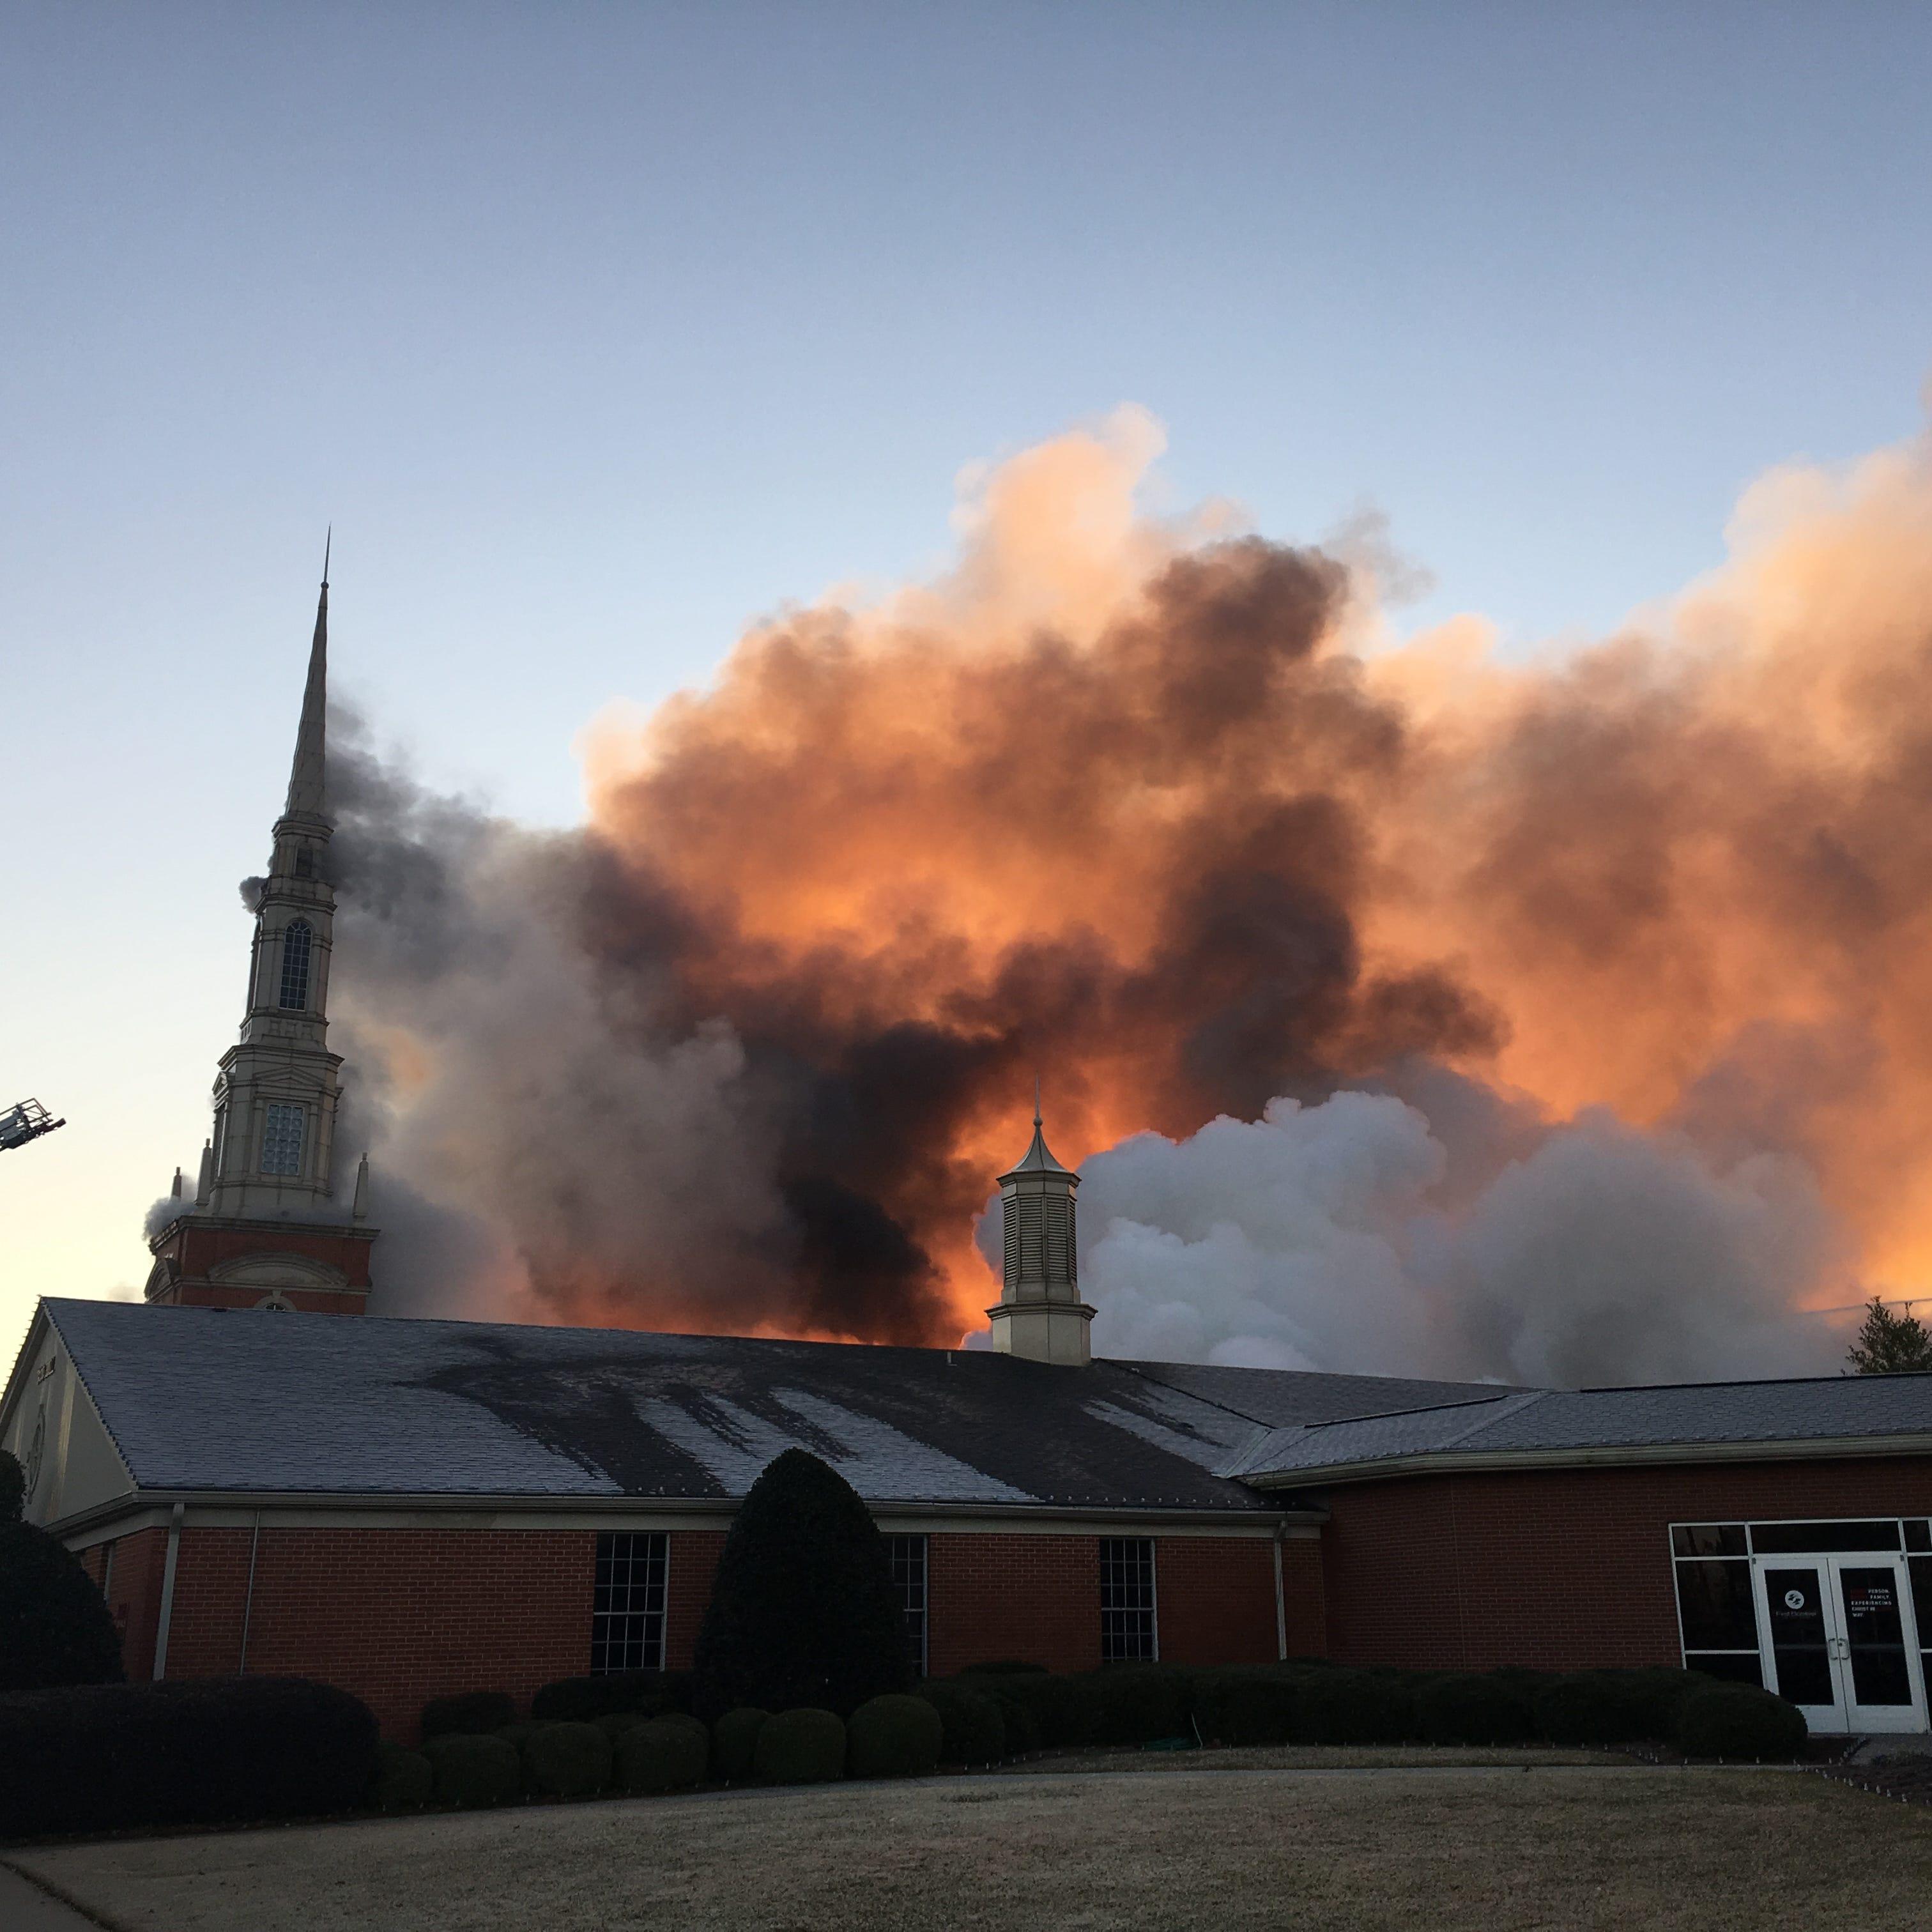 Fire crews battling blaze at First Baptist Church in Bossier